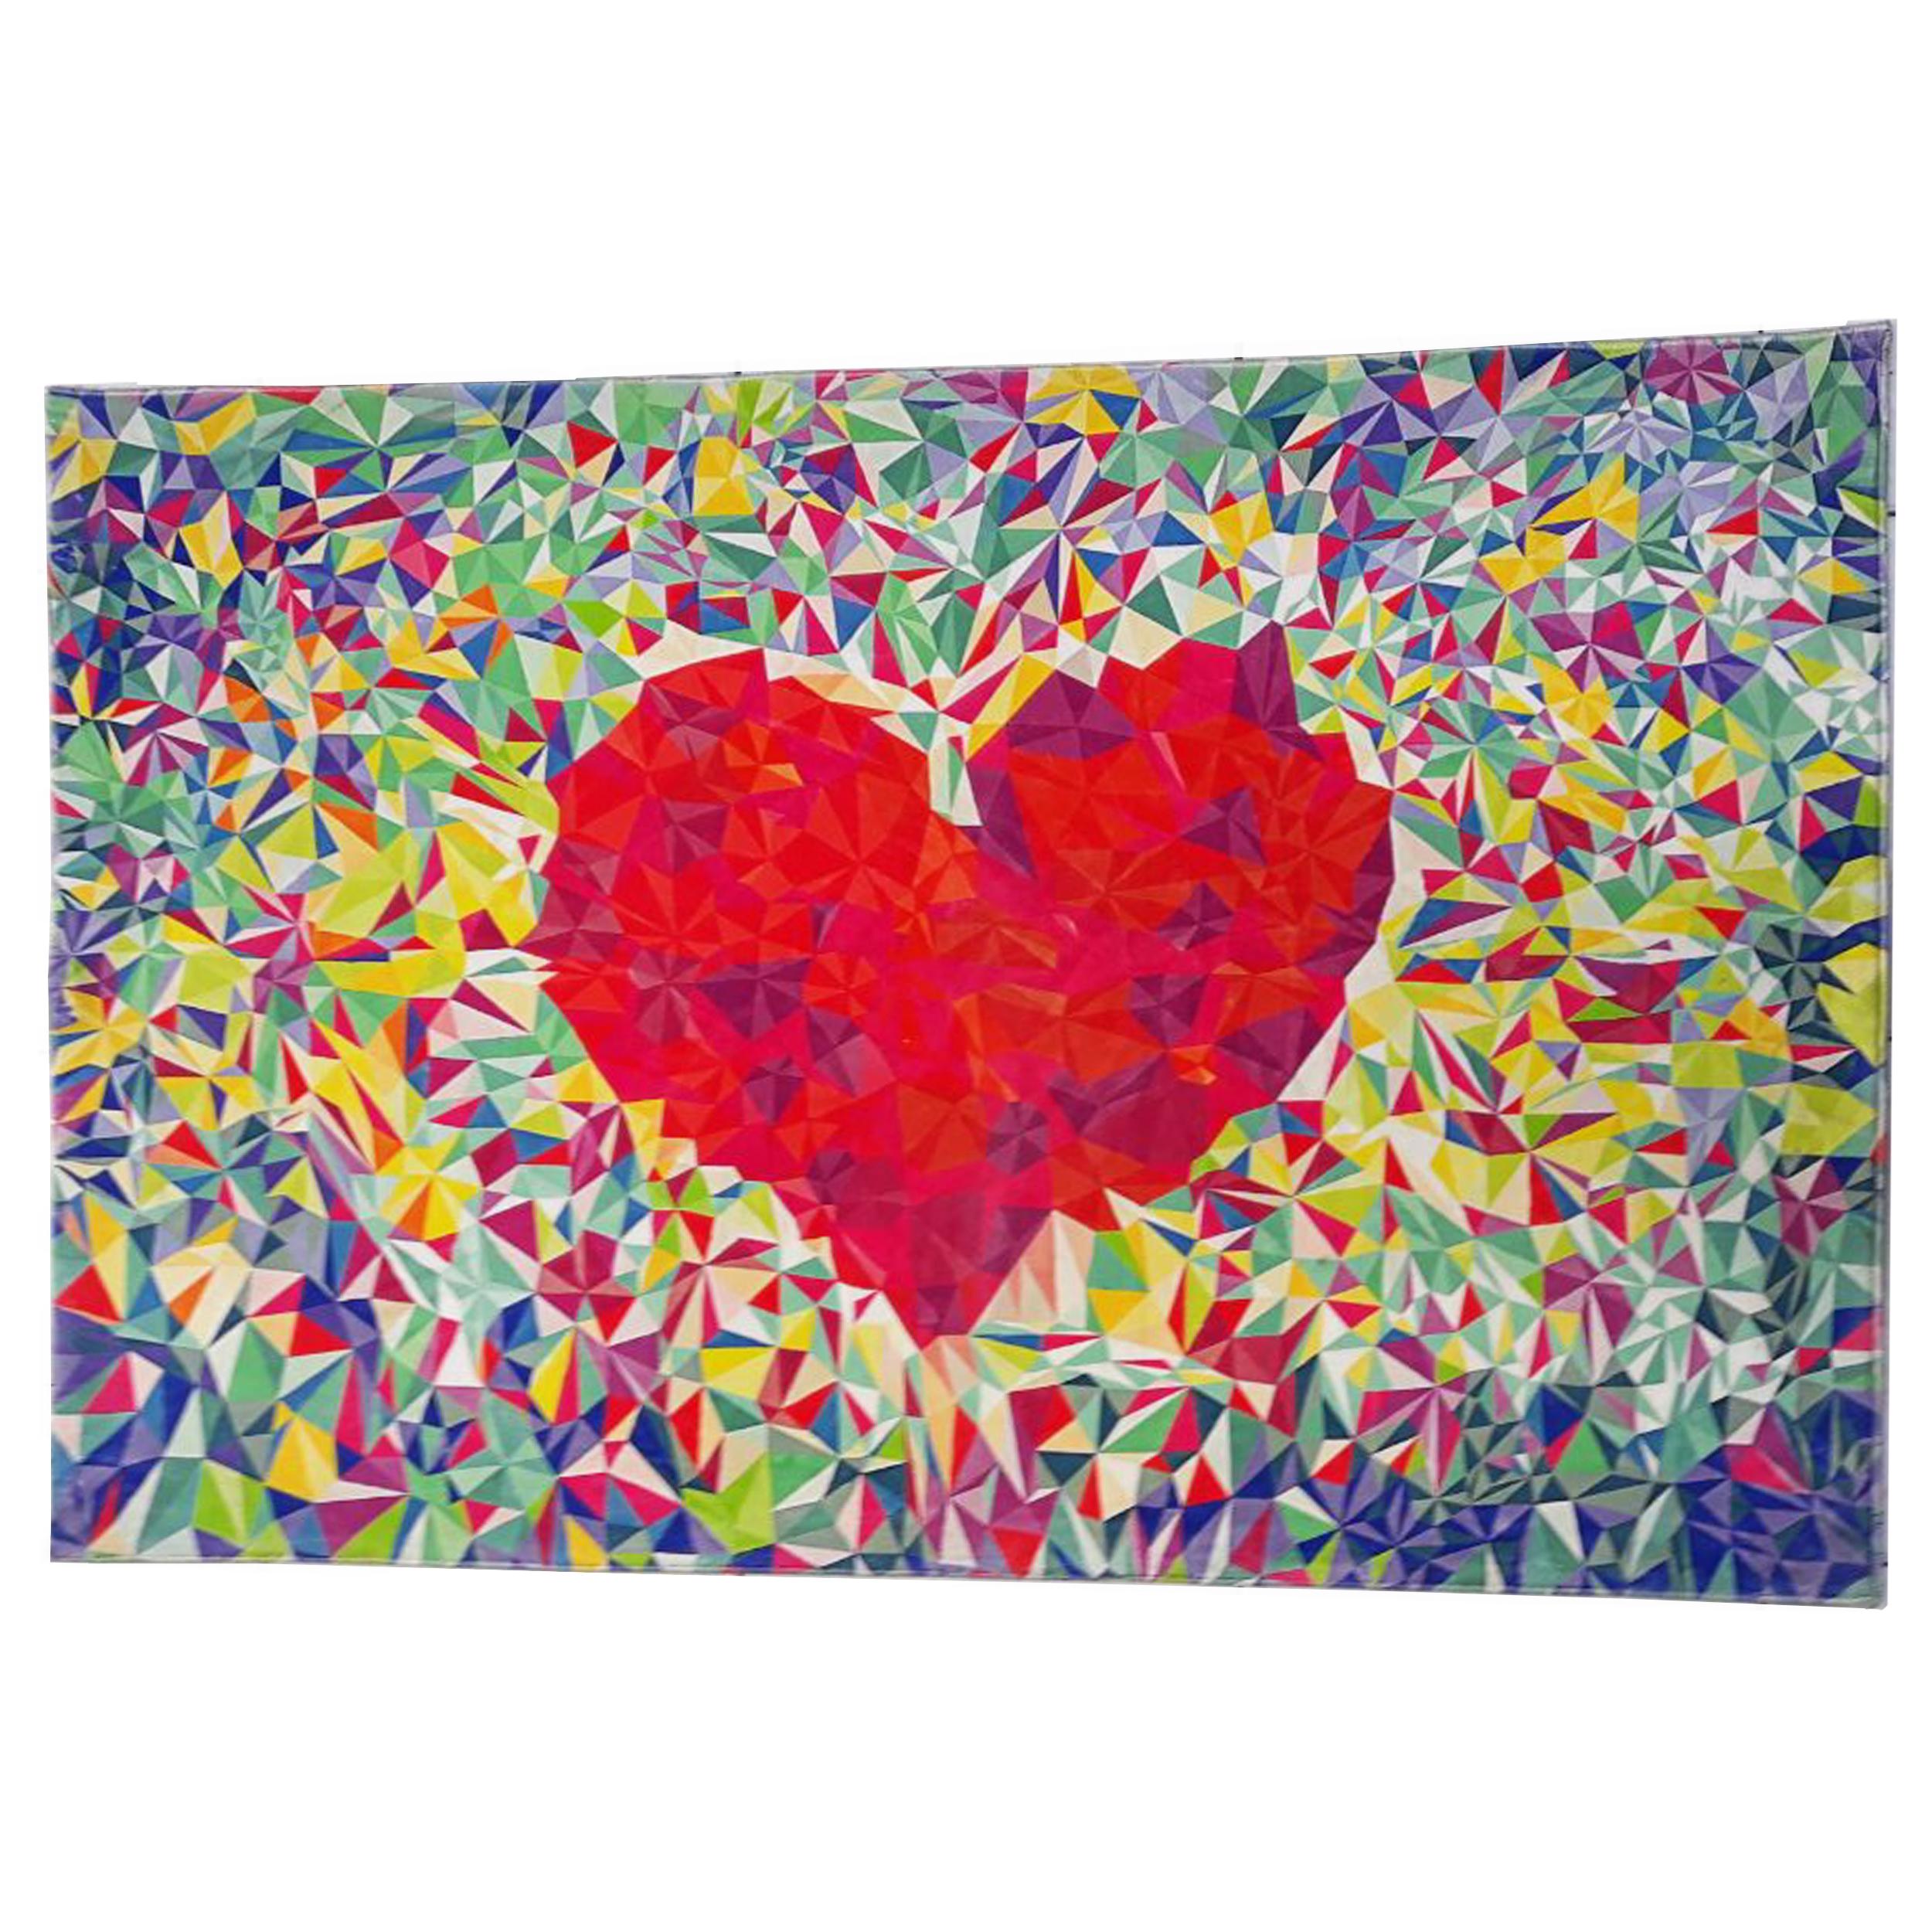 فرش ماشيني فانتزی طرح سه بعدی قلب کد T0102